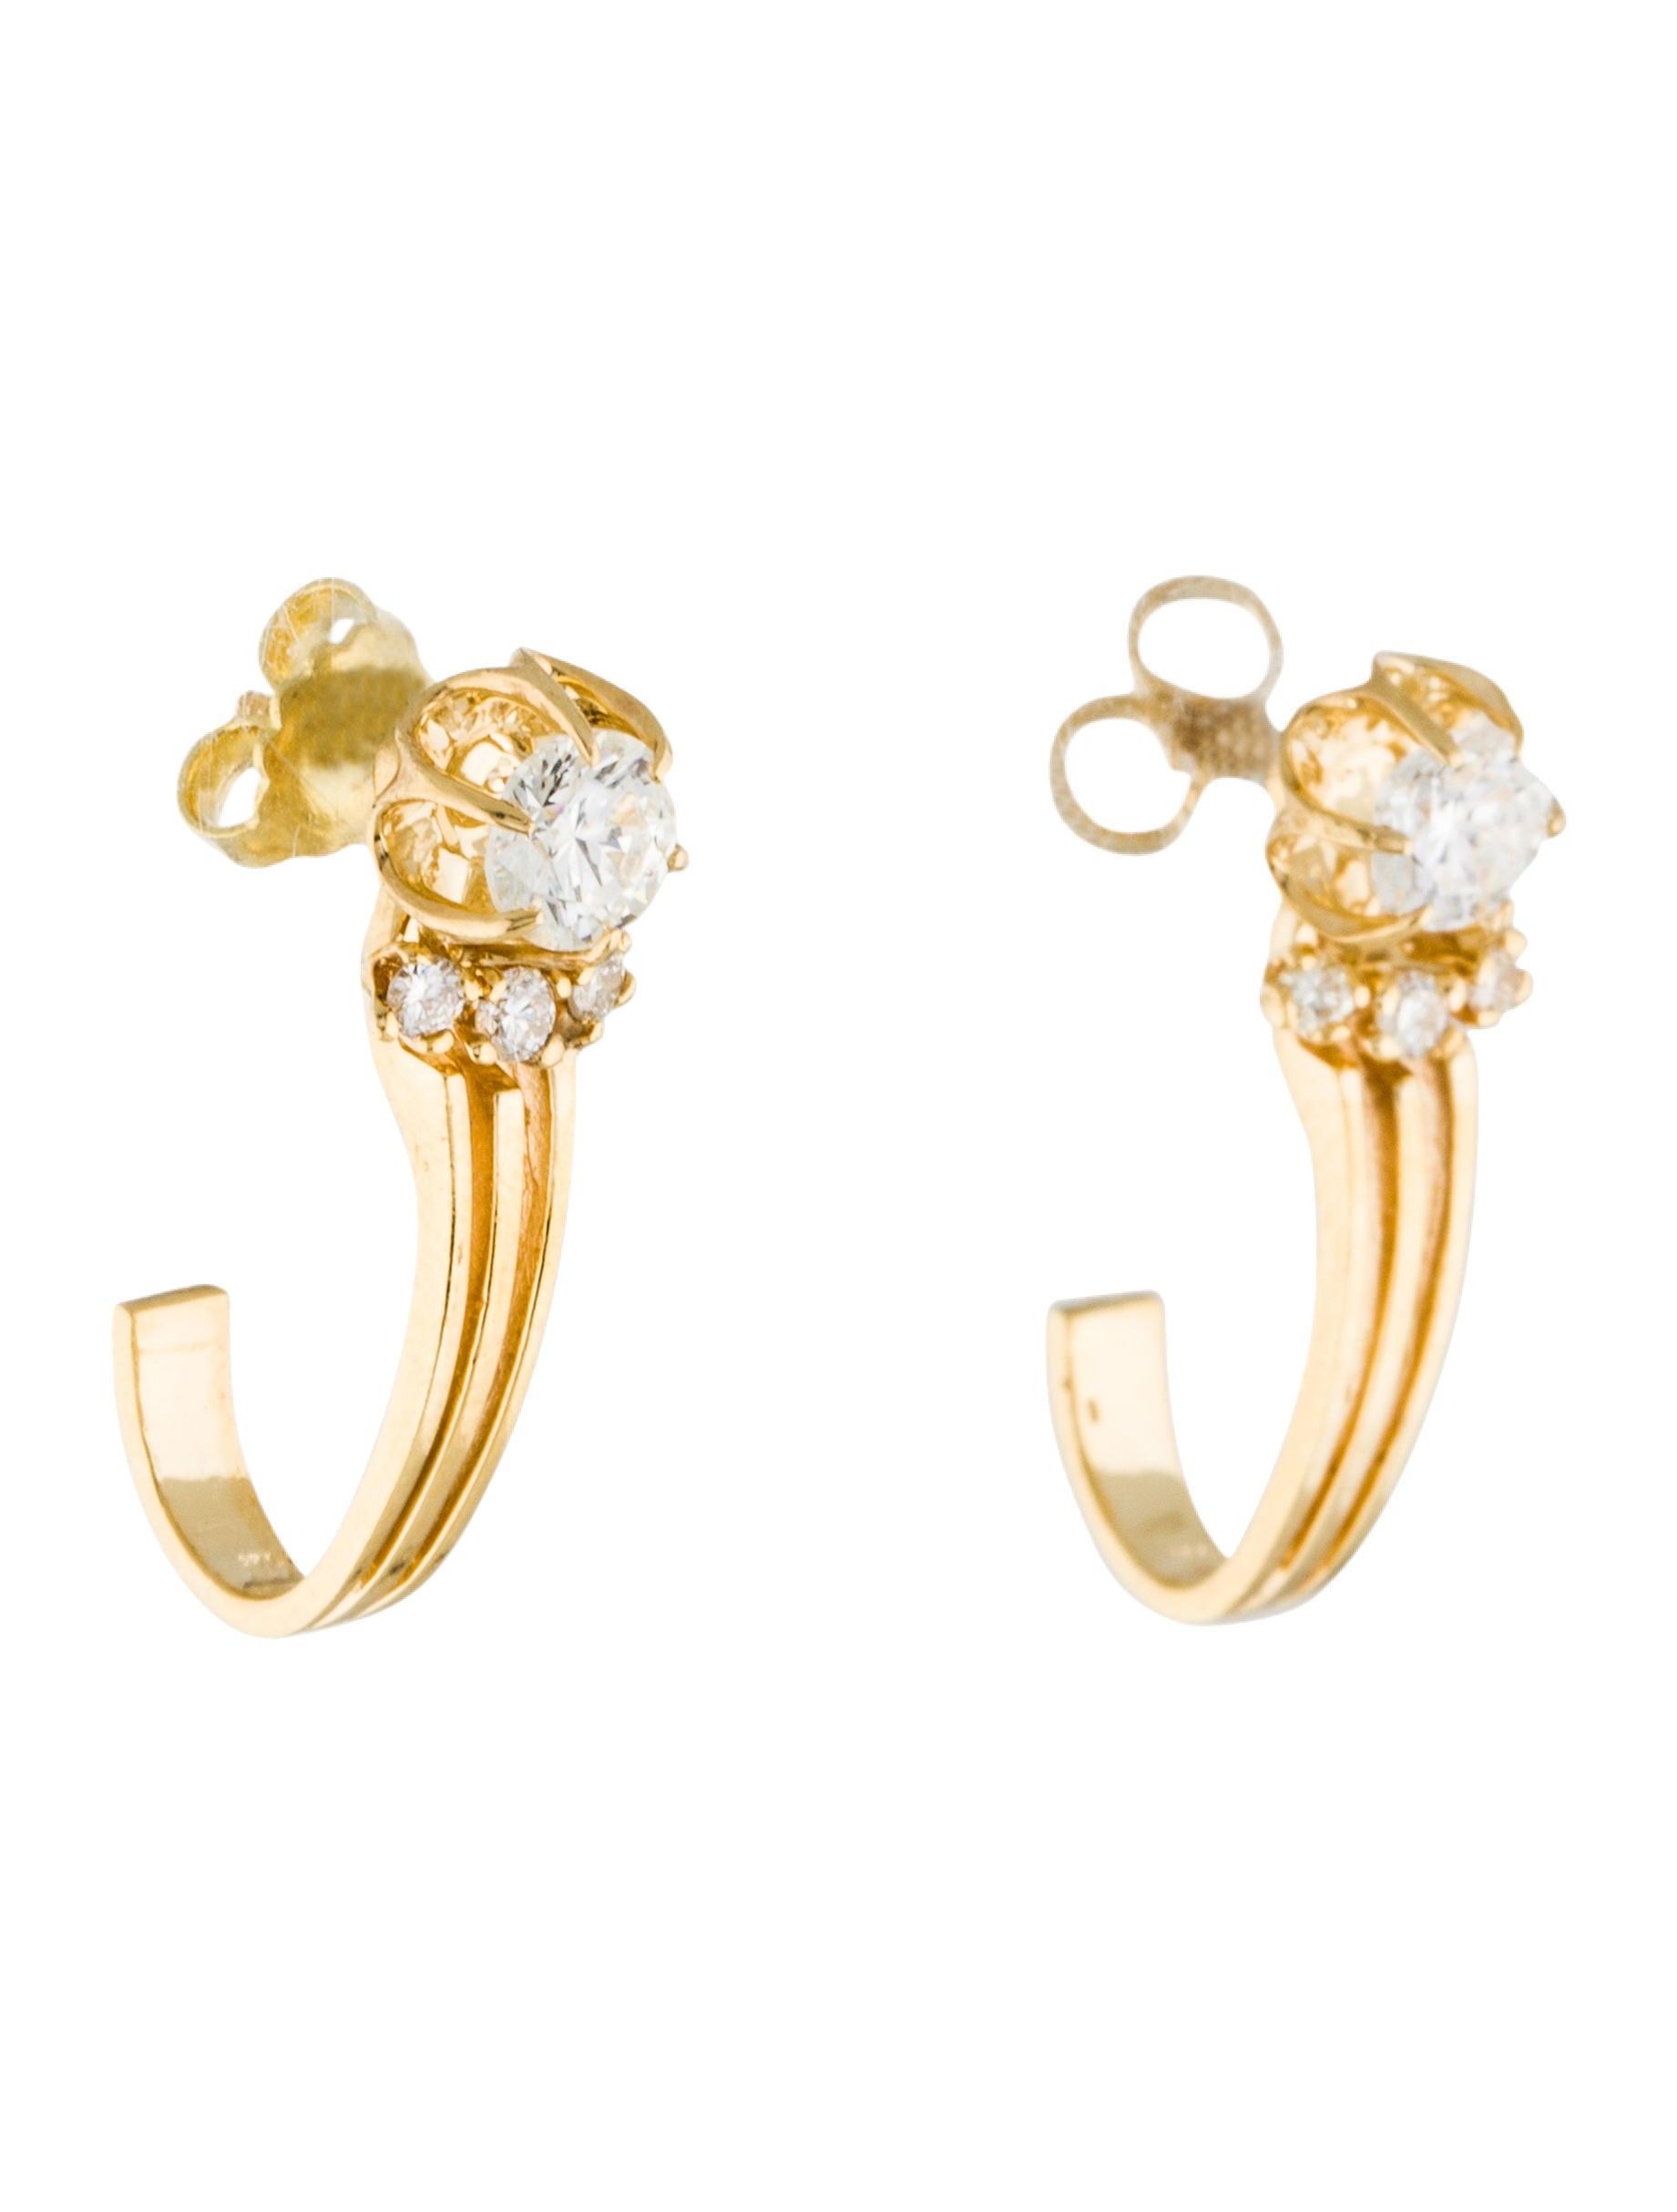 14k diamond earring jackets earrings earri35845 the. Black Bedroom Furniture Sets. Home Design Ideas